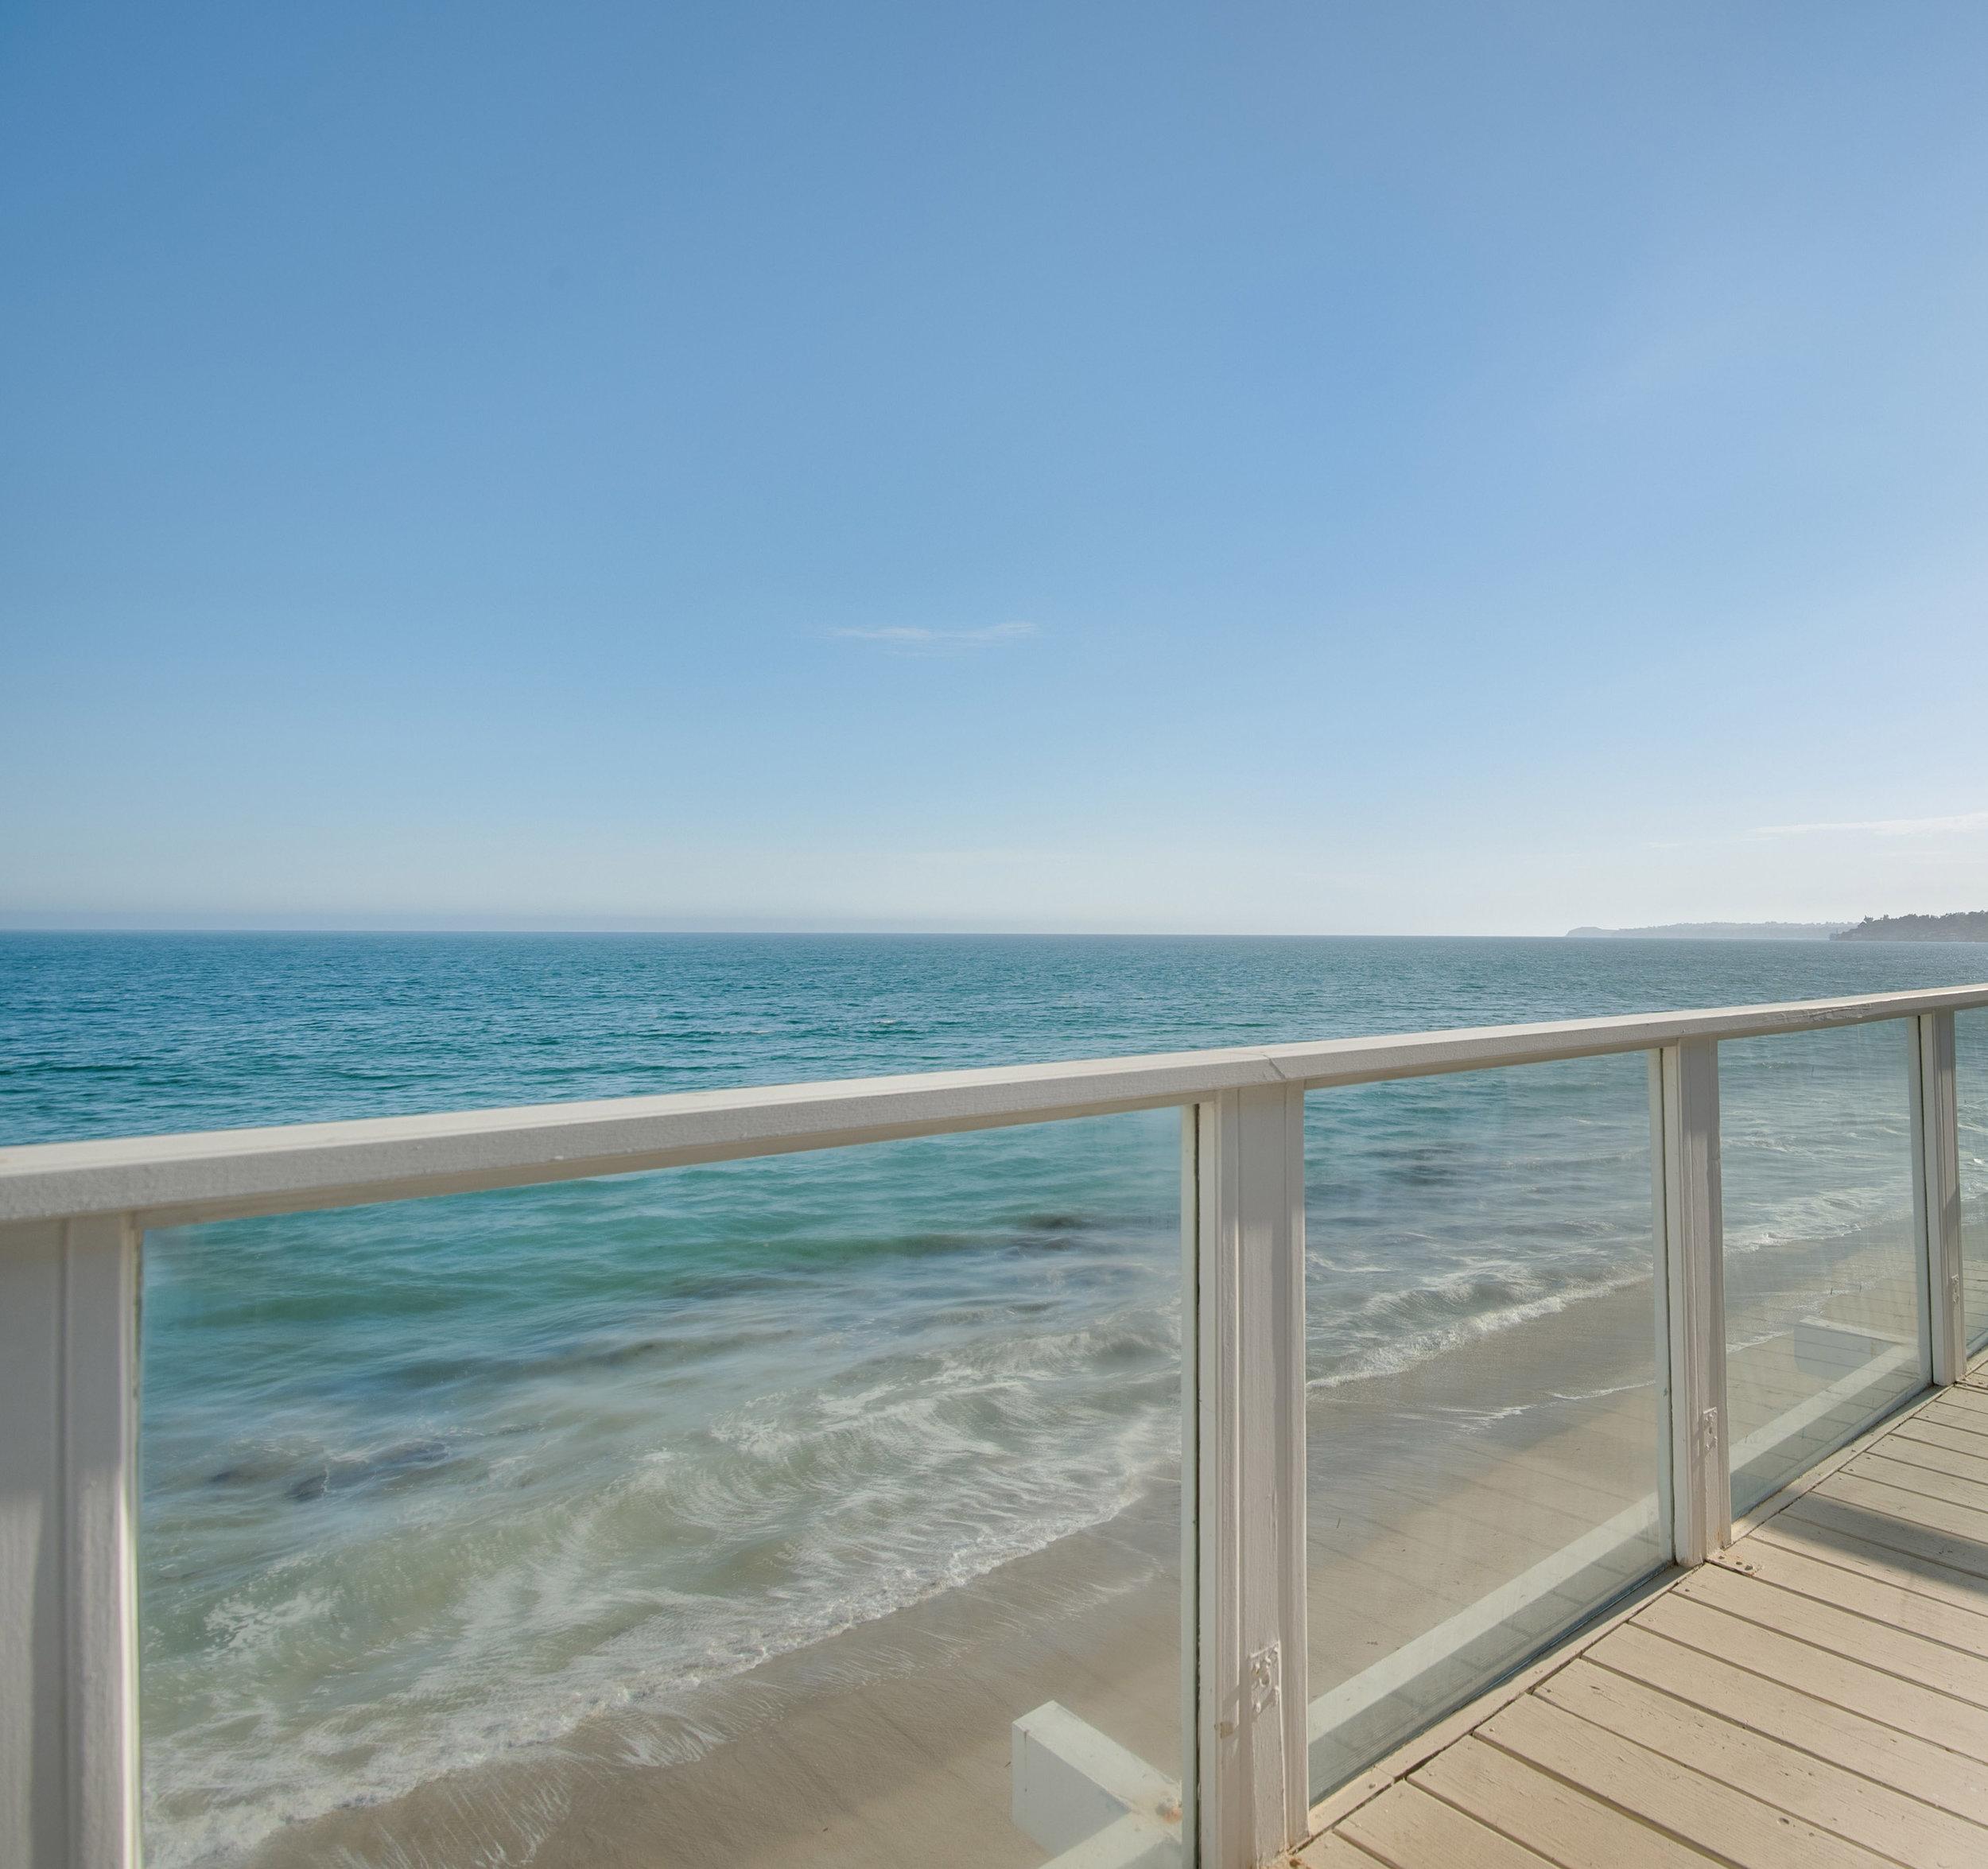 007 Ocean View 25342 Malibu Road For Sale Lease The Malibu Life Team Luxury Real Estate.jpg